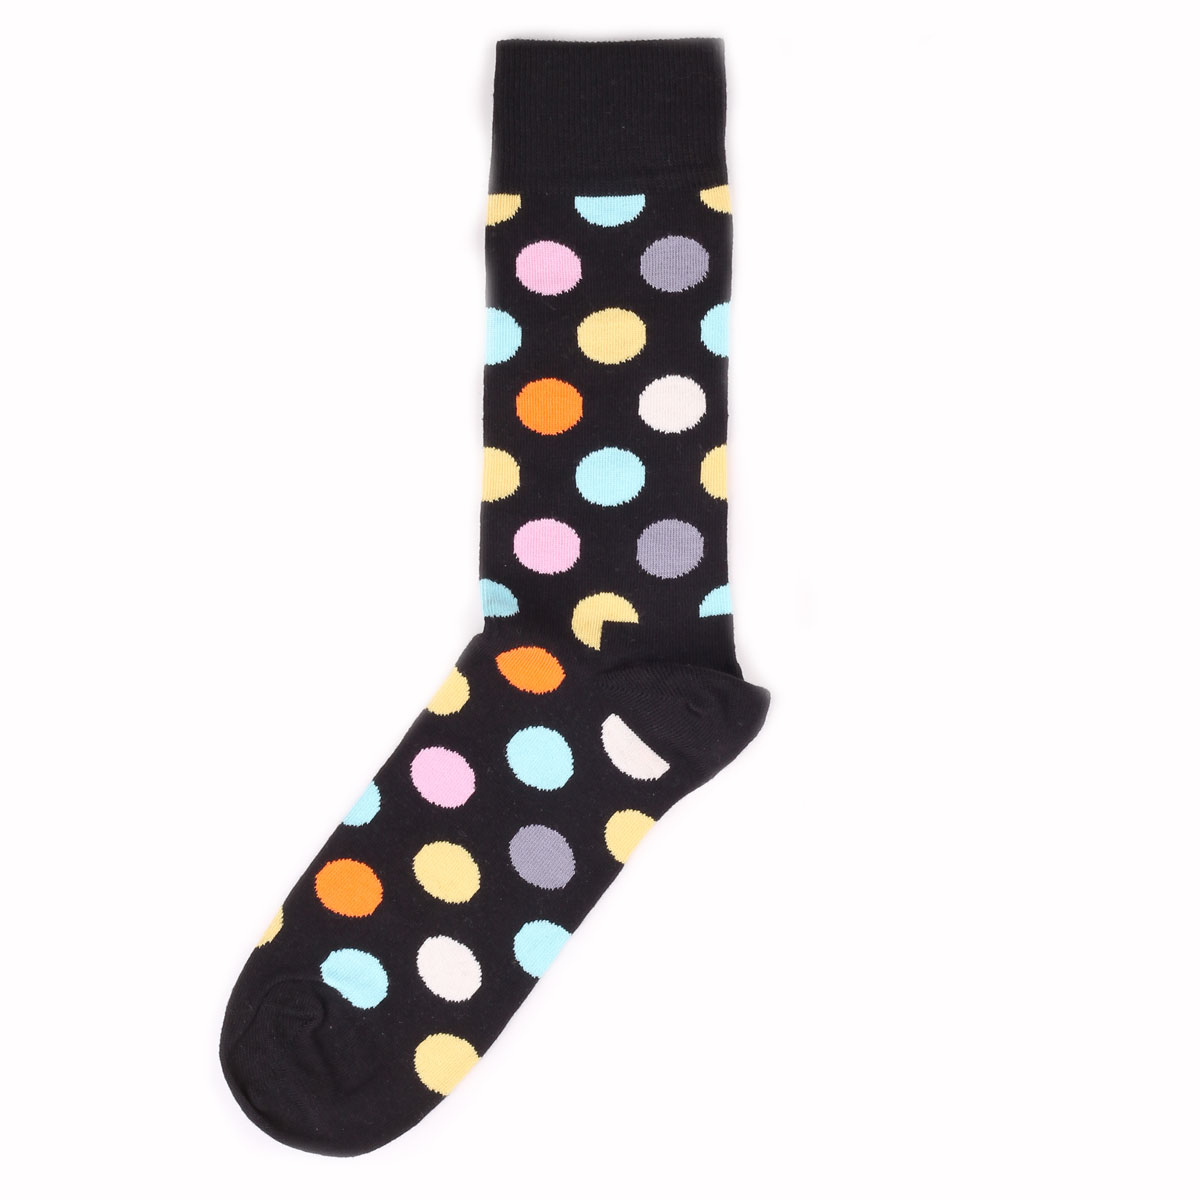 Носки унисекс Happy Socks Happy Socks Big Dot - Multicolor разноцветные 36-40